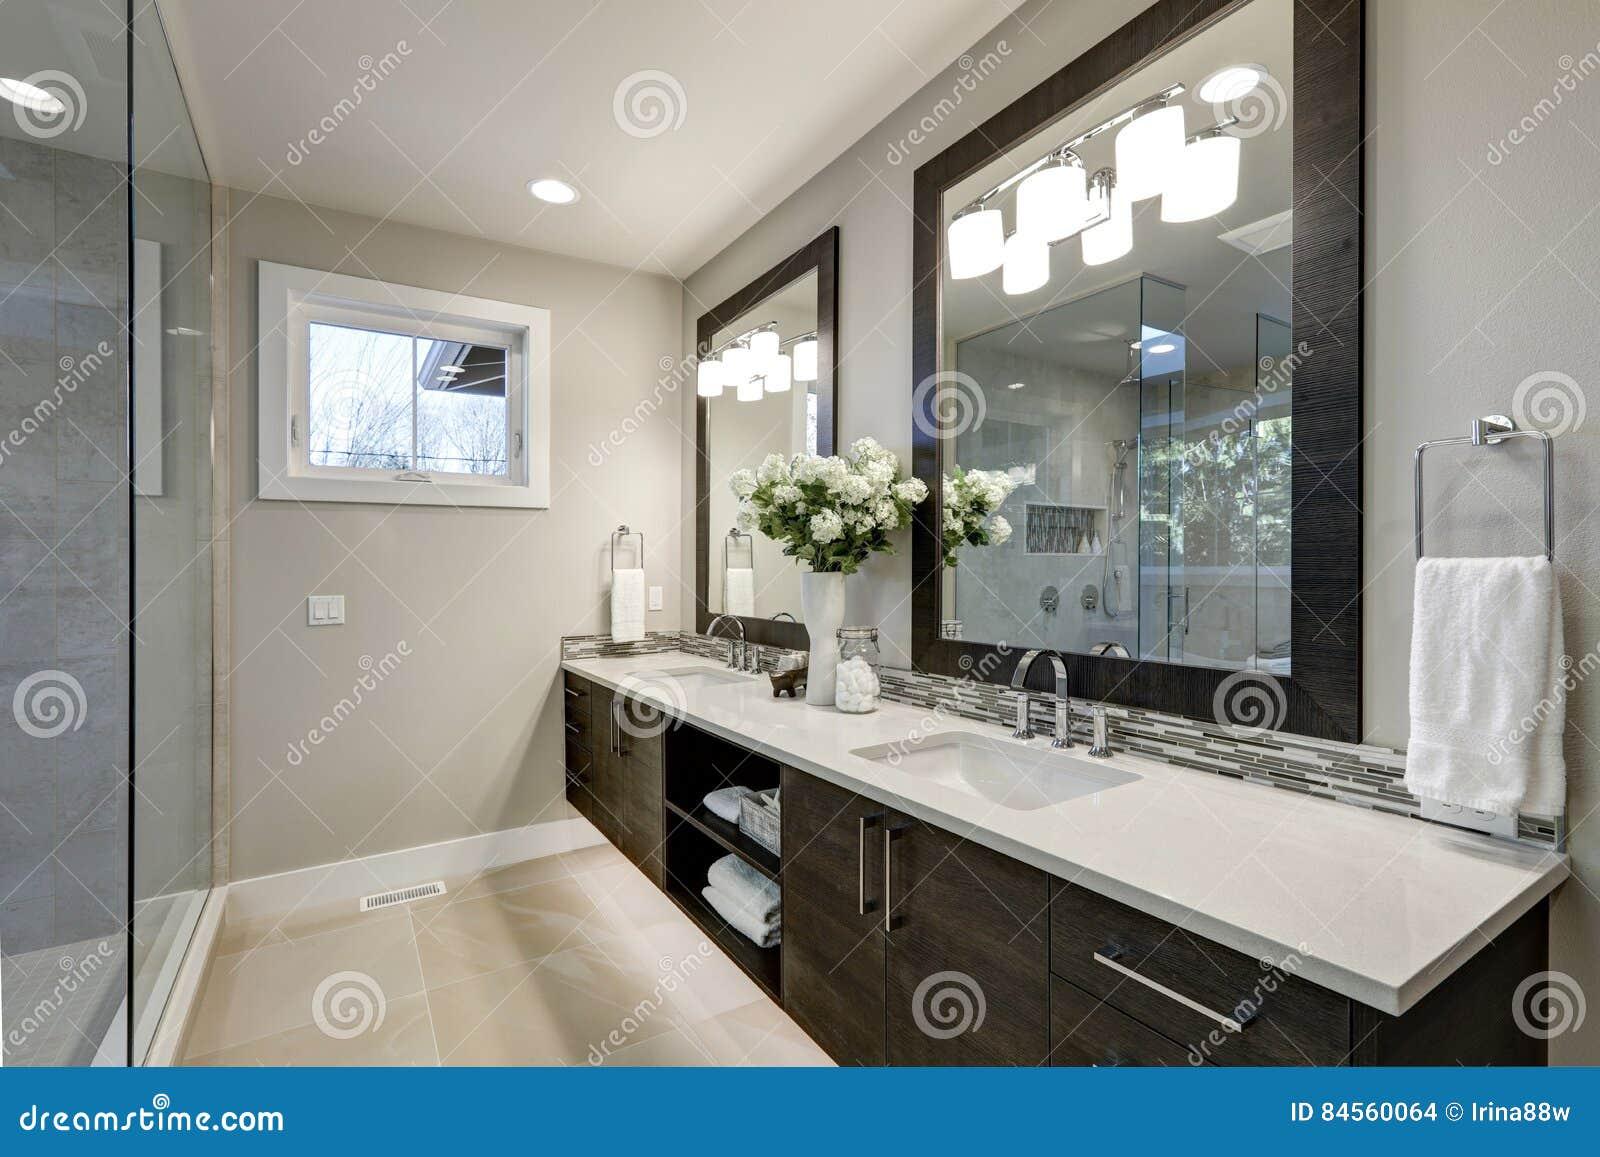 Spacious Bathroom In Gray Tones Wizth Long Vanity Stock Photo Image Of Building Architect 84560064